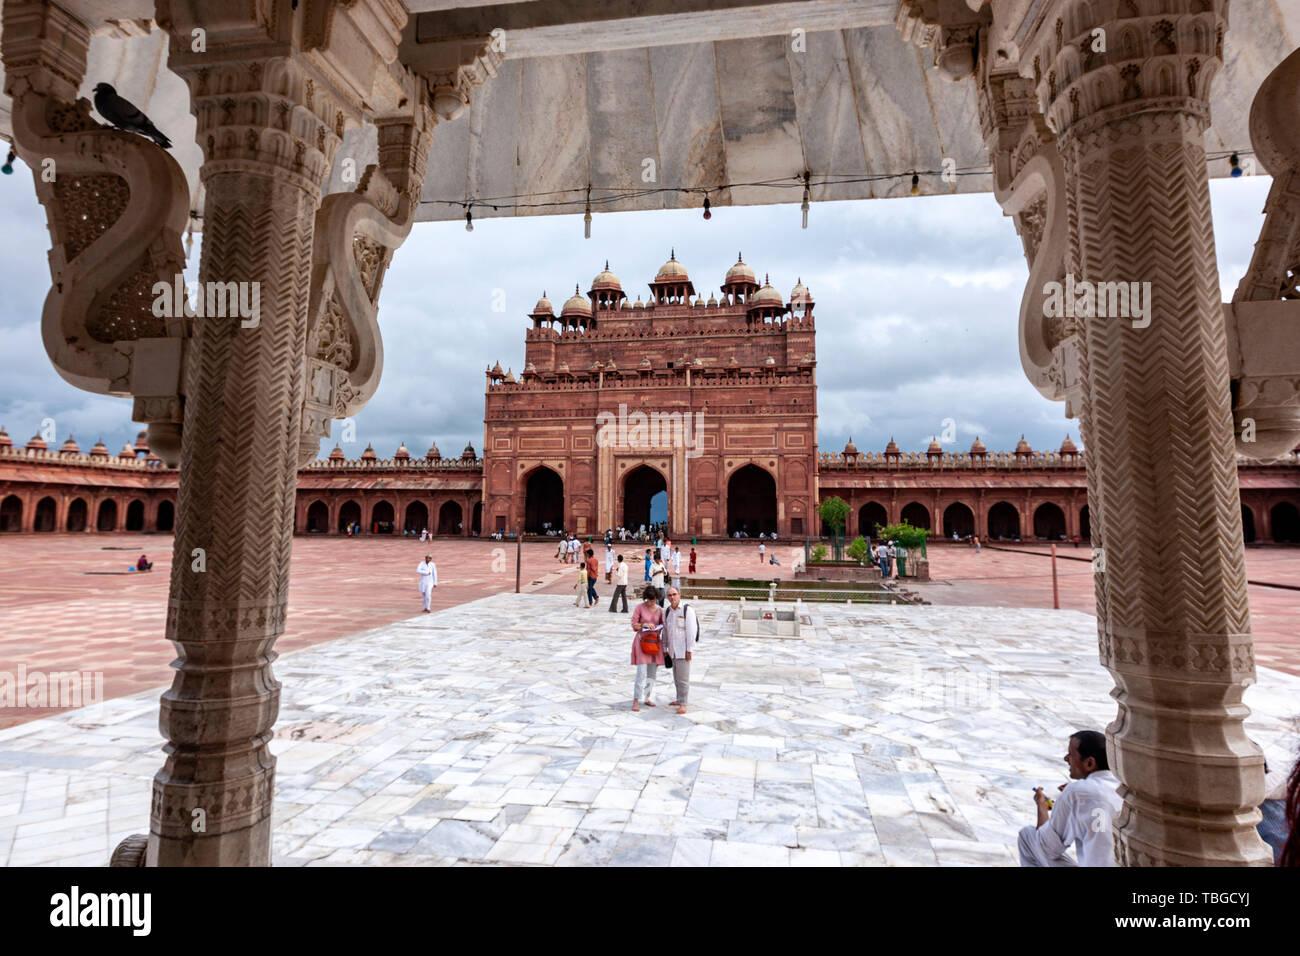 Buland Darwaza from Sufi Saint Shiakh Salim Chistis Tomb in Jama Masjid, Jama Mosque, Fatehpur Sikri, Agra District of Uttar Pradesh, India. - Stock Image